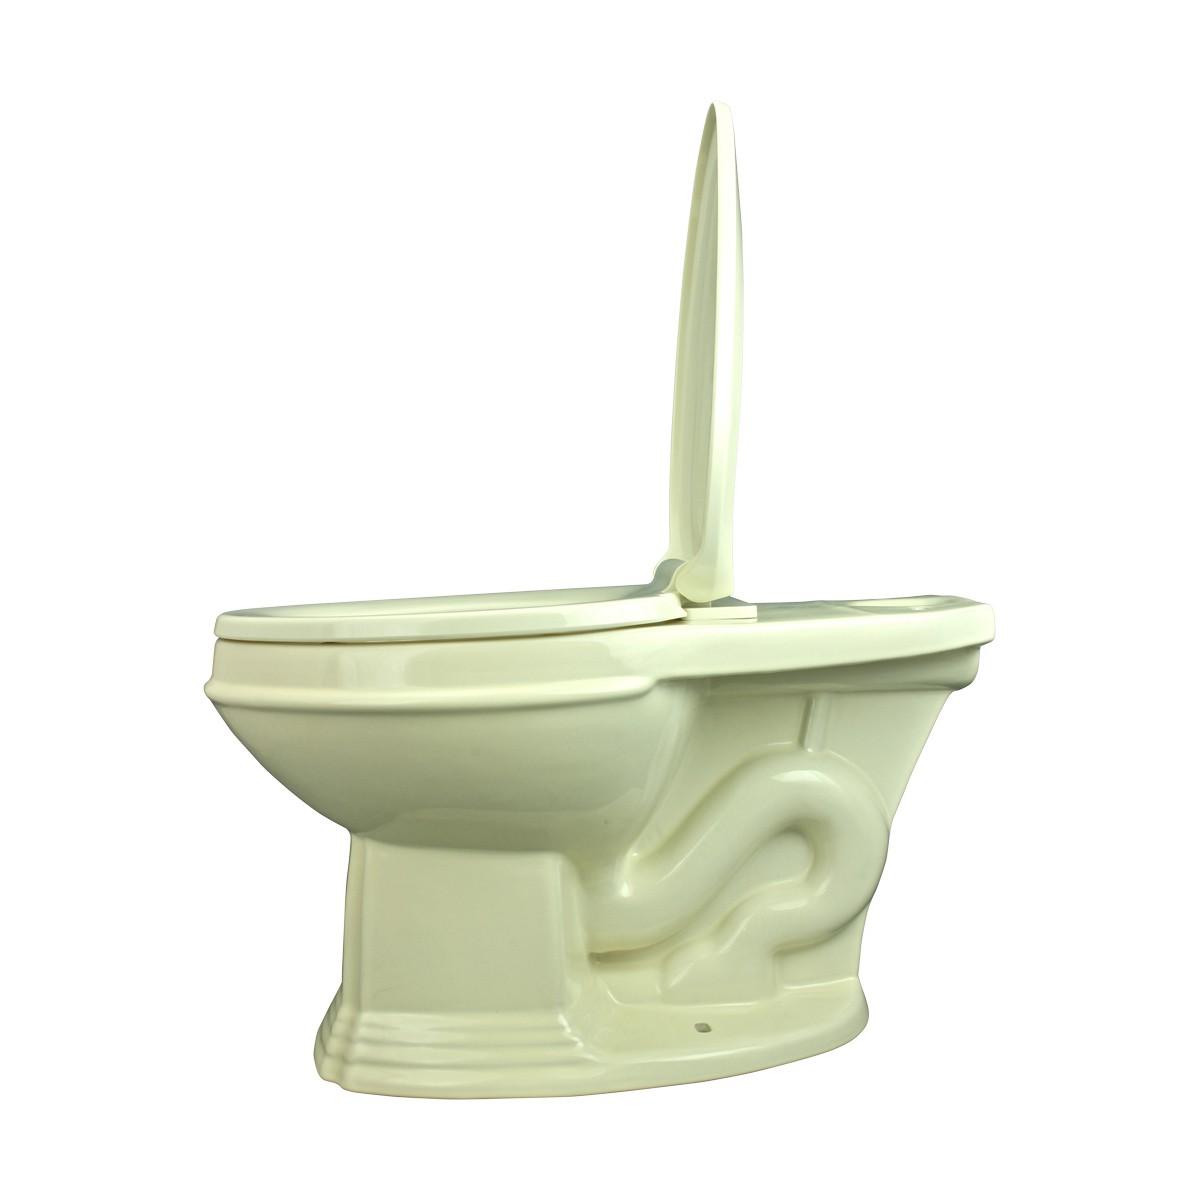 Awesome Toilet Part Bone Sheffield 19 Elongate Toilet Bowl Only Ibusinesslaw Wood Chair Design Ideas Ibusinesslaworg